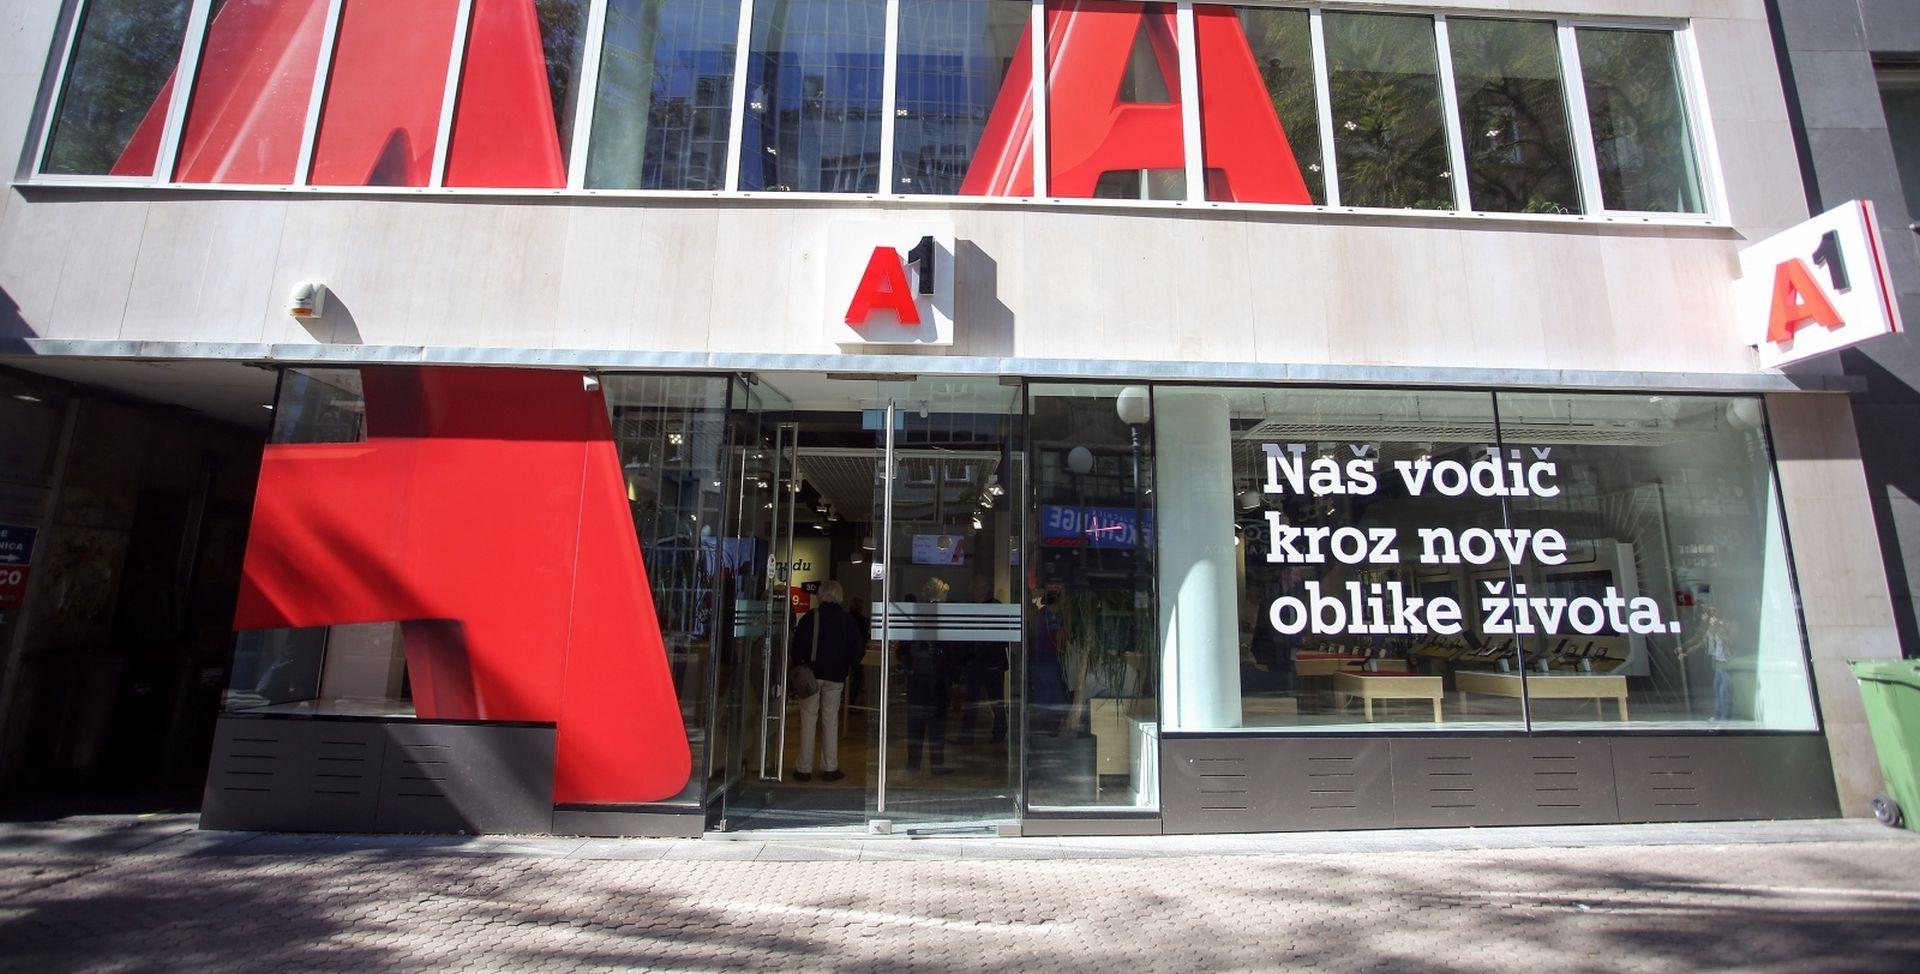 A1 Hrvatska od danas novo ime i brend telekoma Vipnet